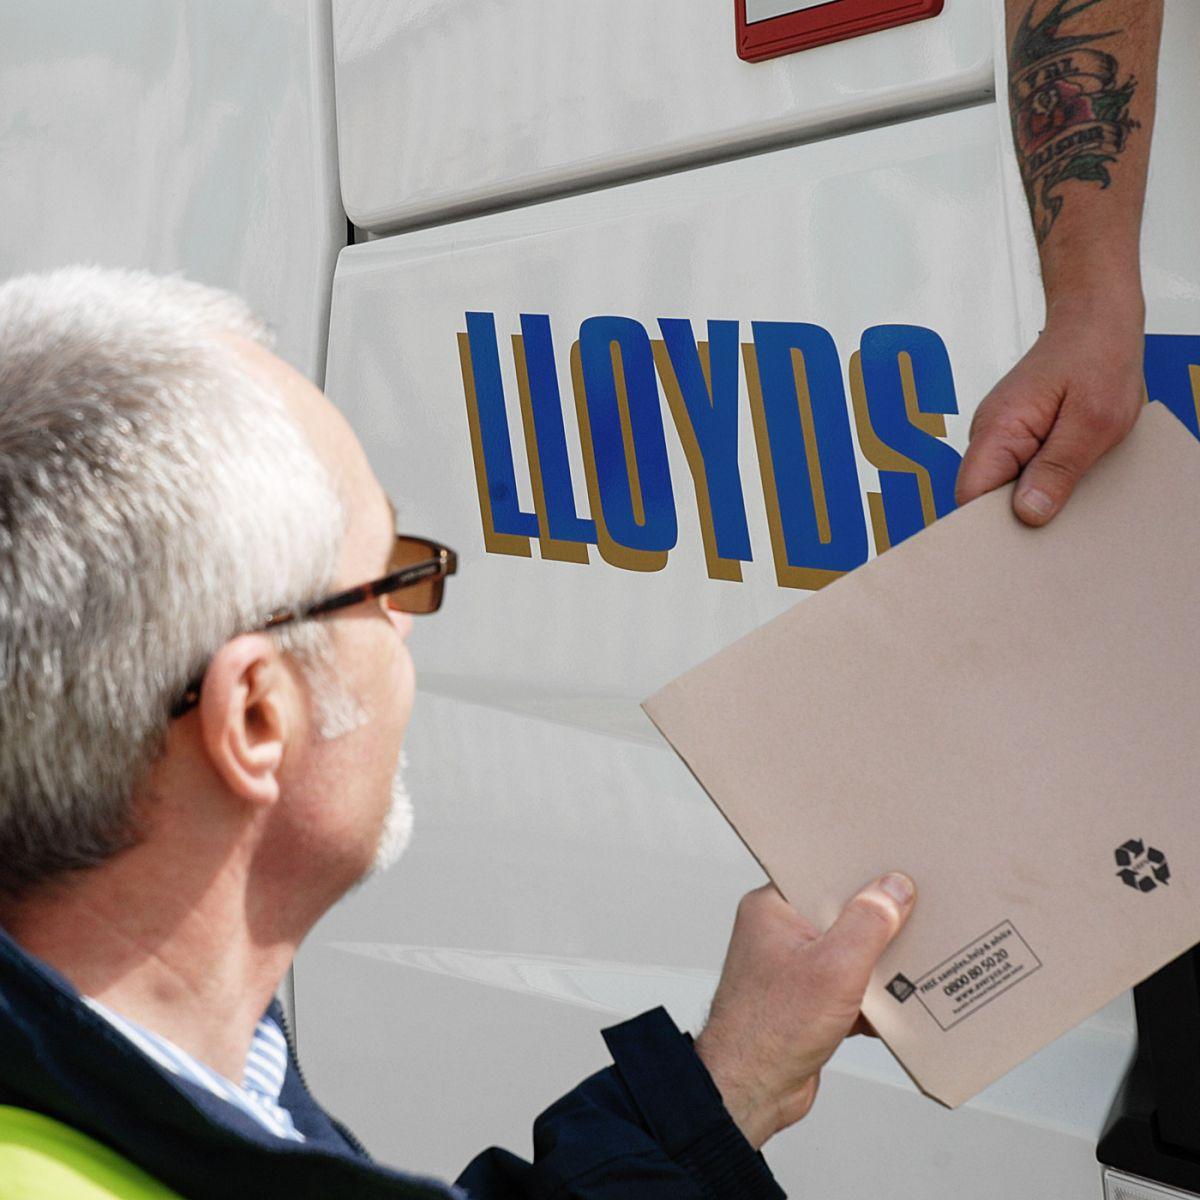 Lloyds Paperwork Handover